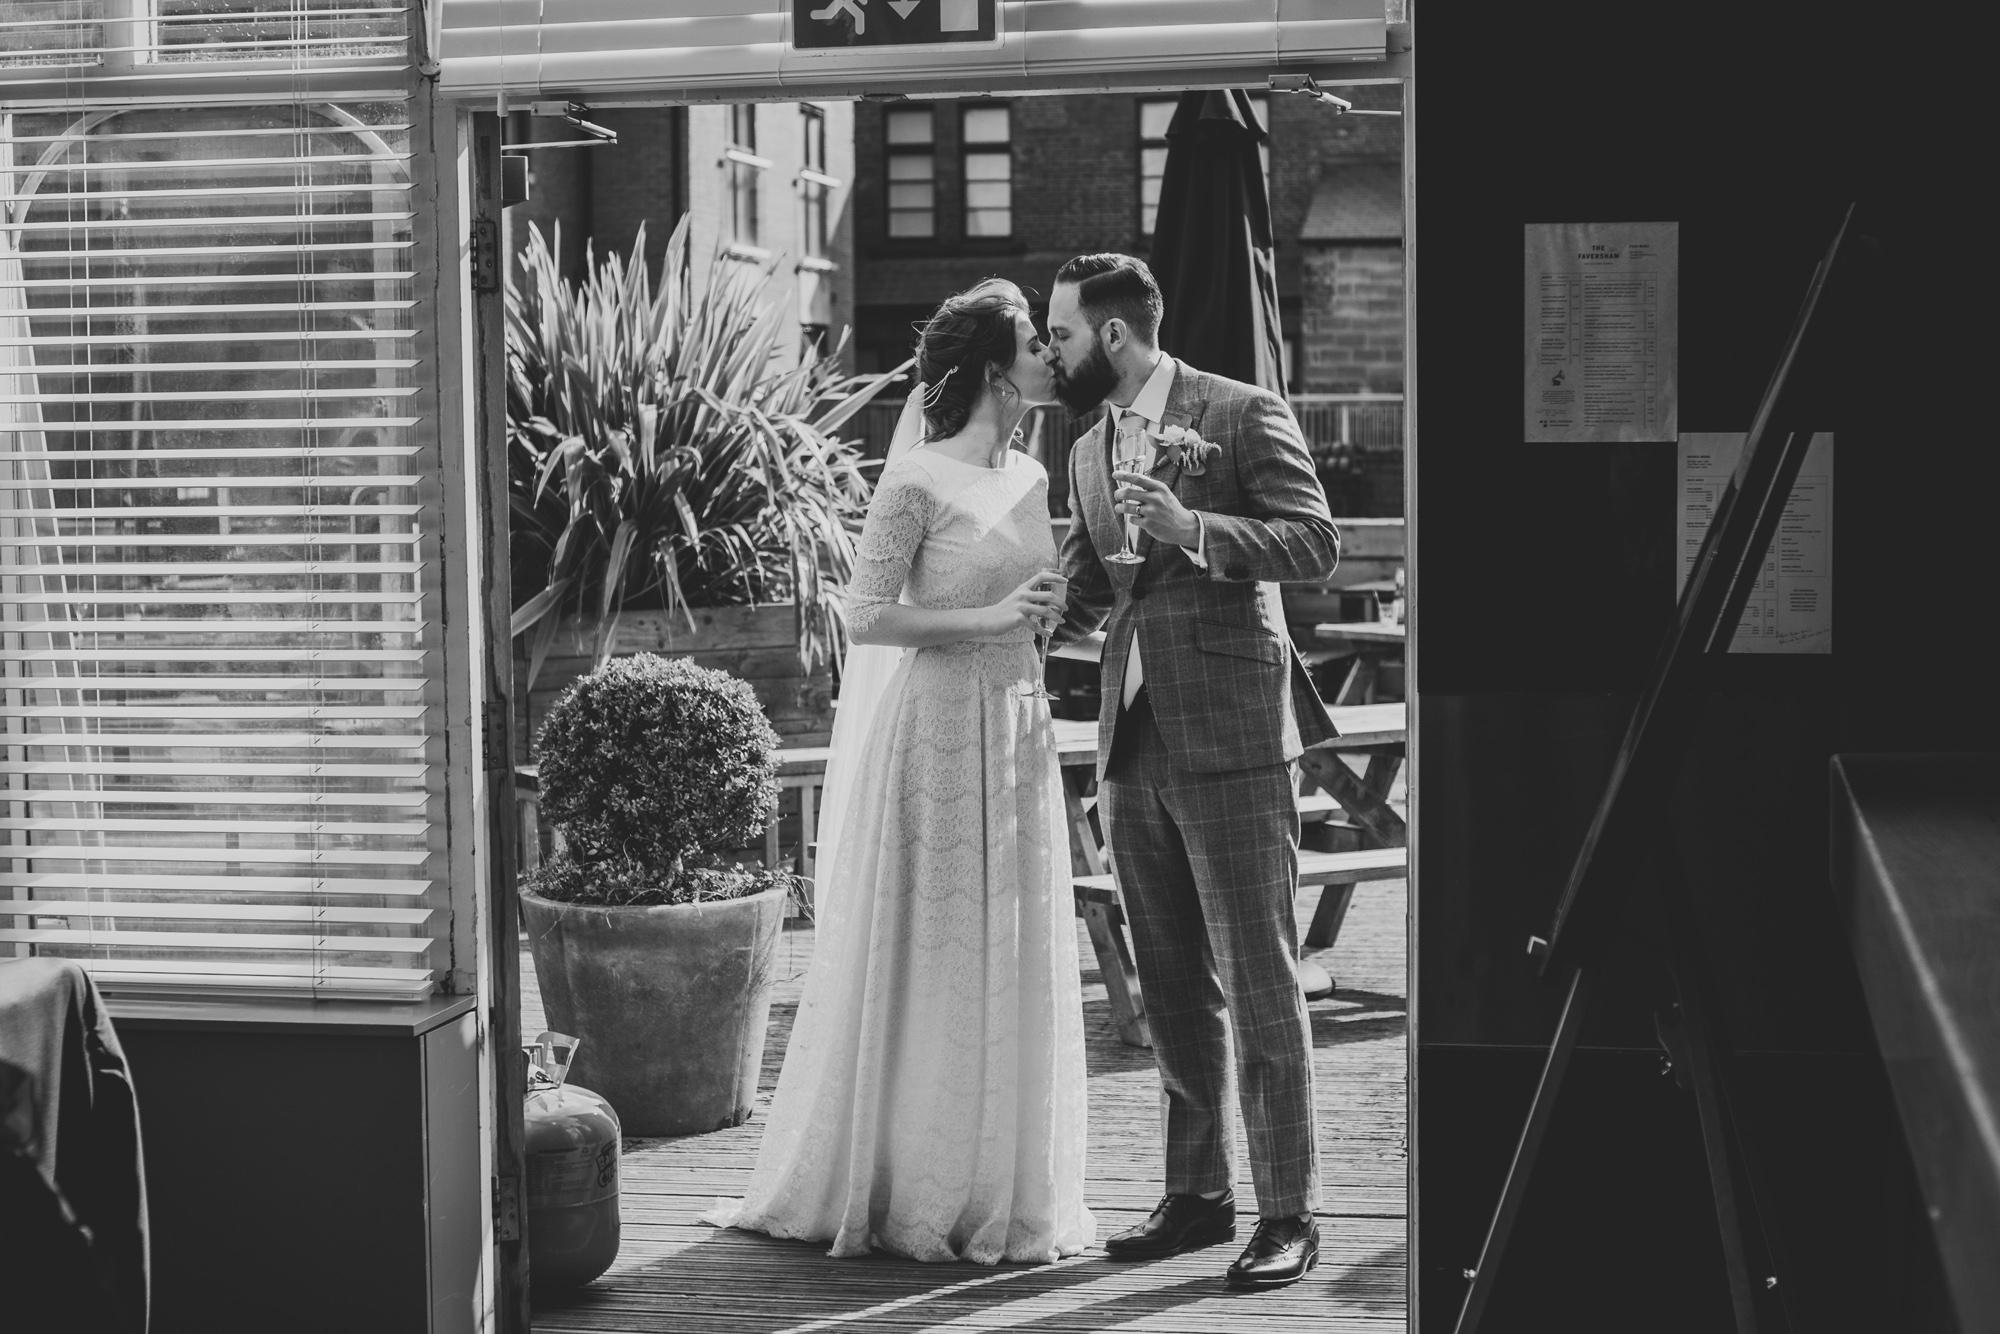 Kate-Beaumont-Lace-Flared-Dahlia-Gown-Leeds-Wedding-Bloom-Weddings-46.jpg